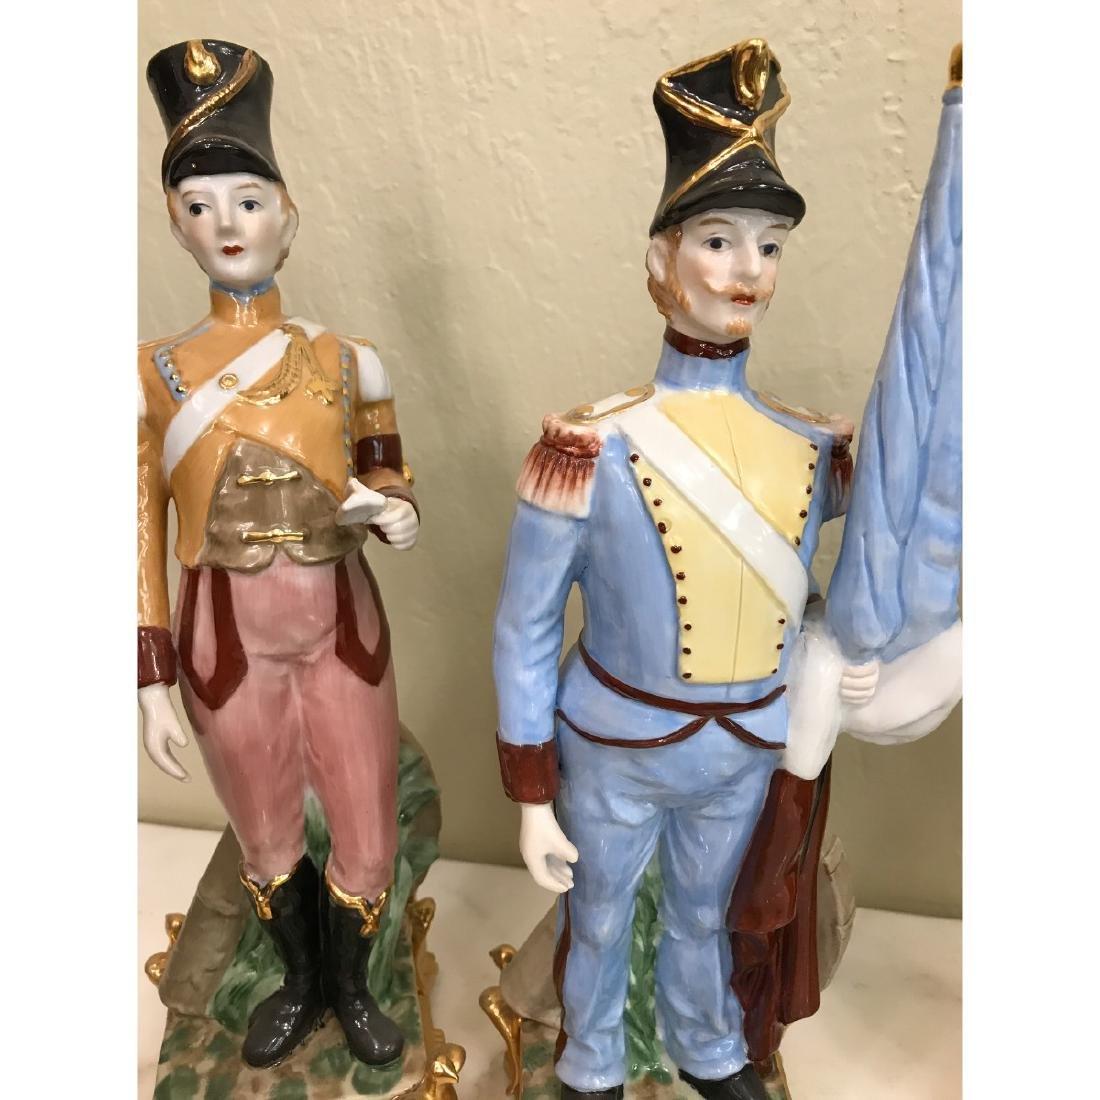 Set of 5 Porcelain Soldier Statues - 9